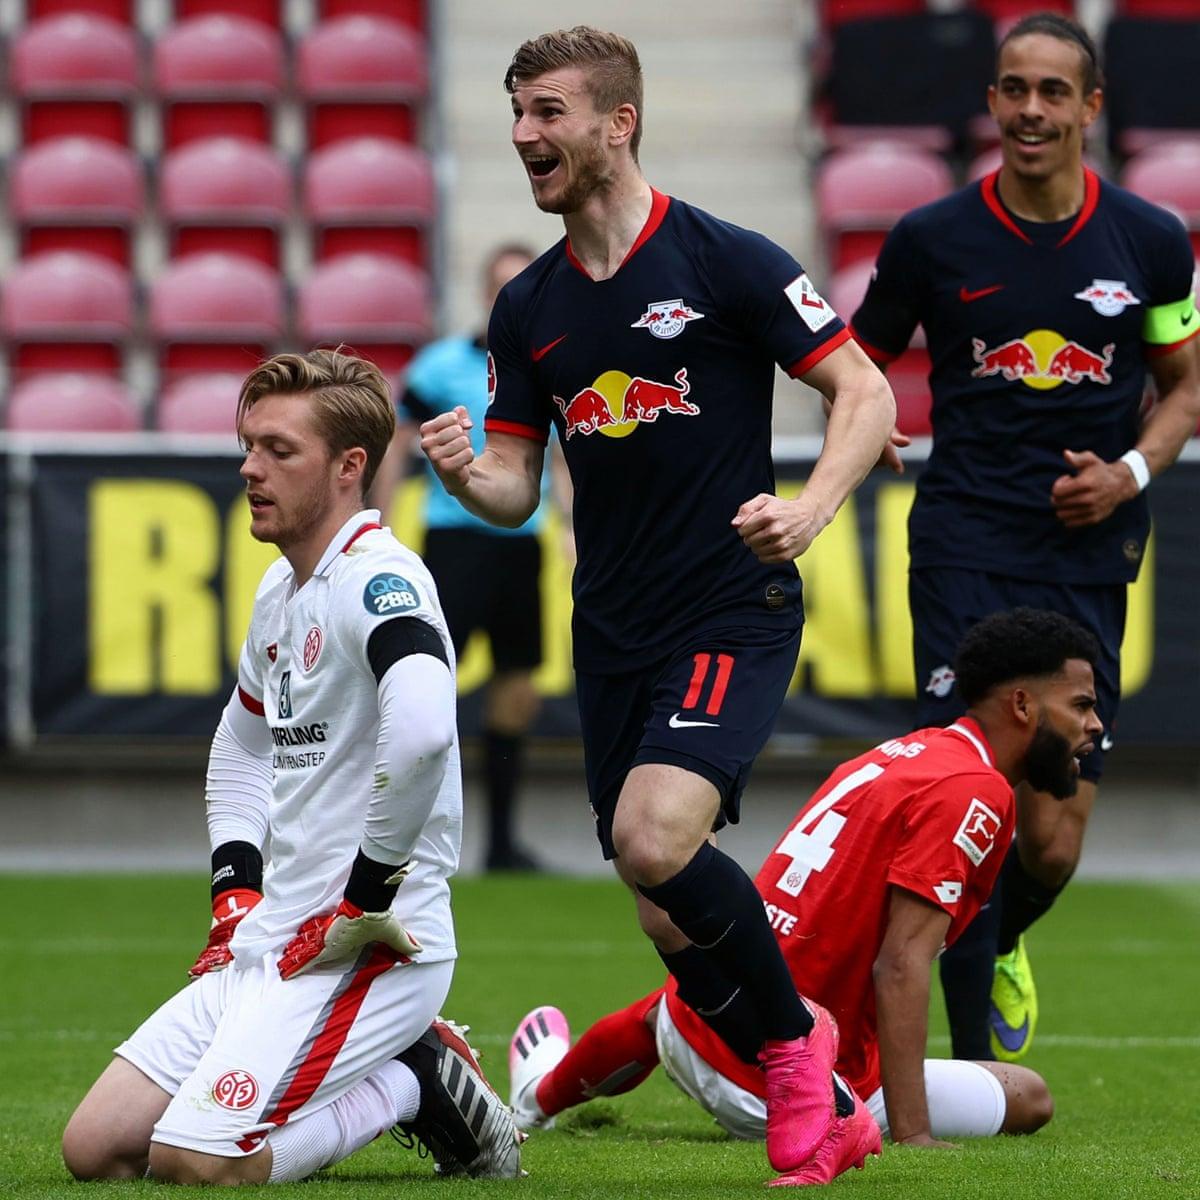 Mainz 0 5 Rb Leipzig Bundesliga As It Happened Football The Guardian